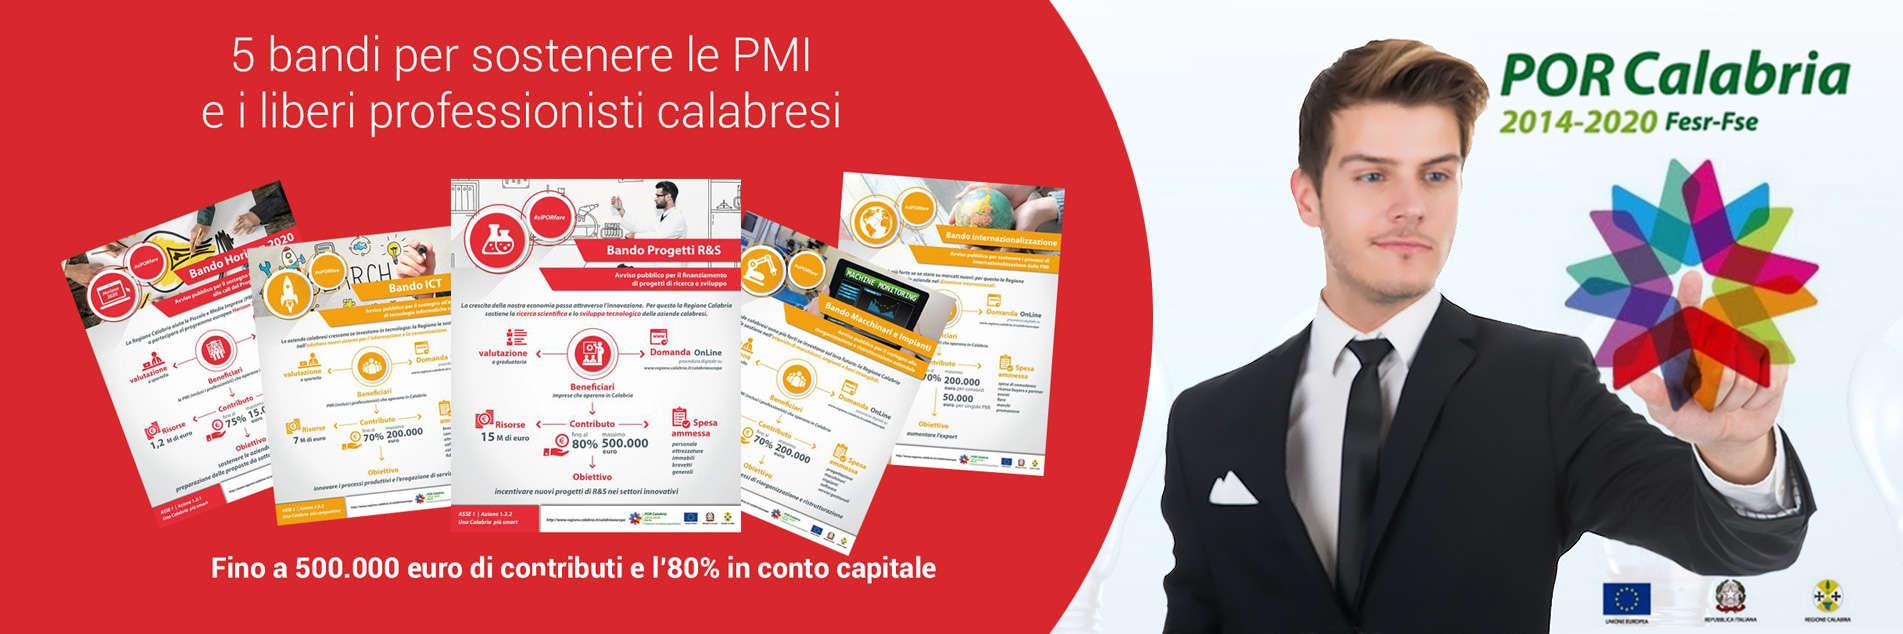 Announcements for innovation and competitiveness: POR CALABRIA FESR-FSE 2014-2020